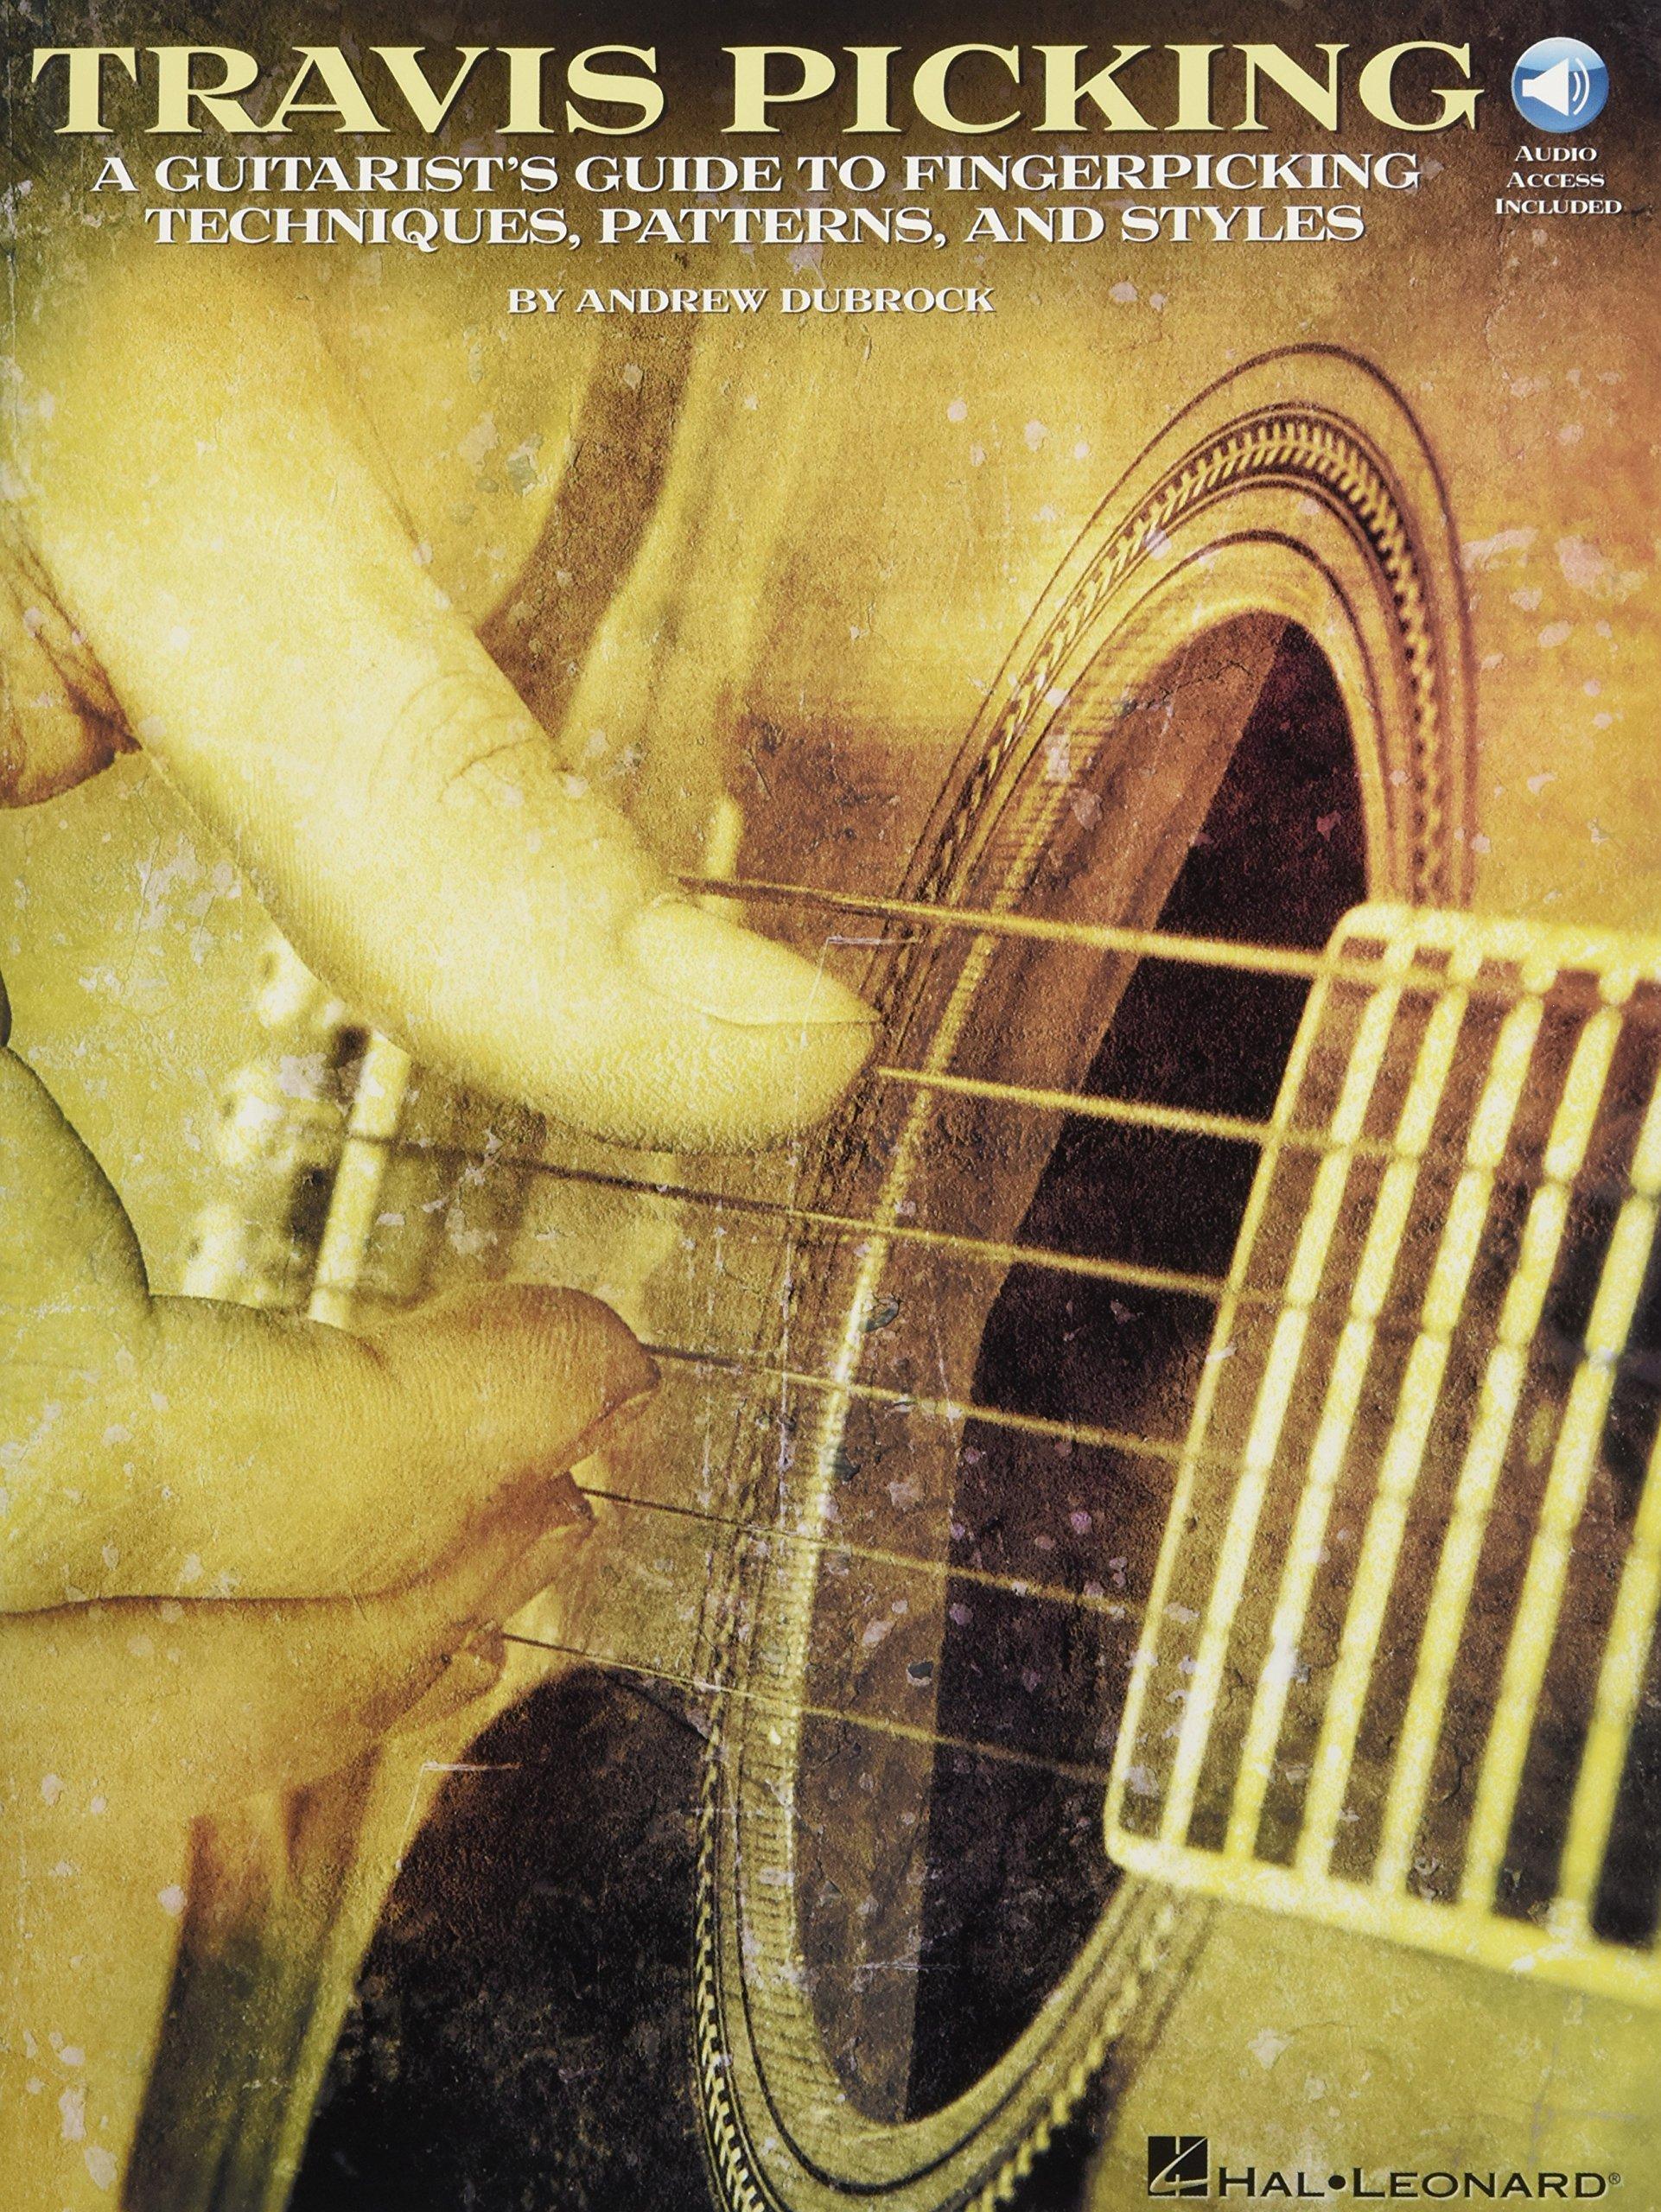 Top 10 Best travis picking guitar books